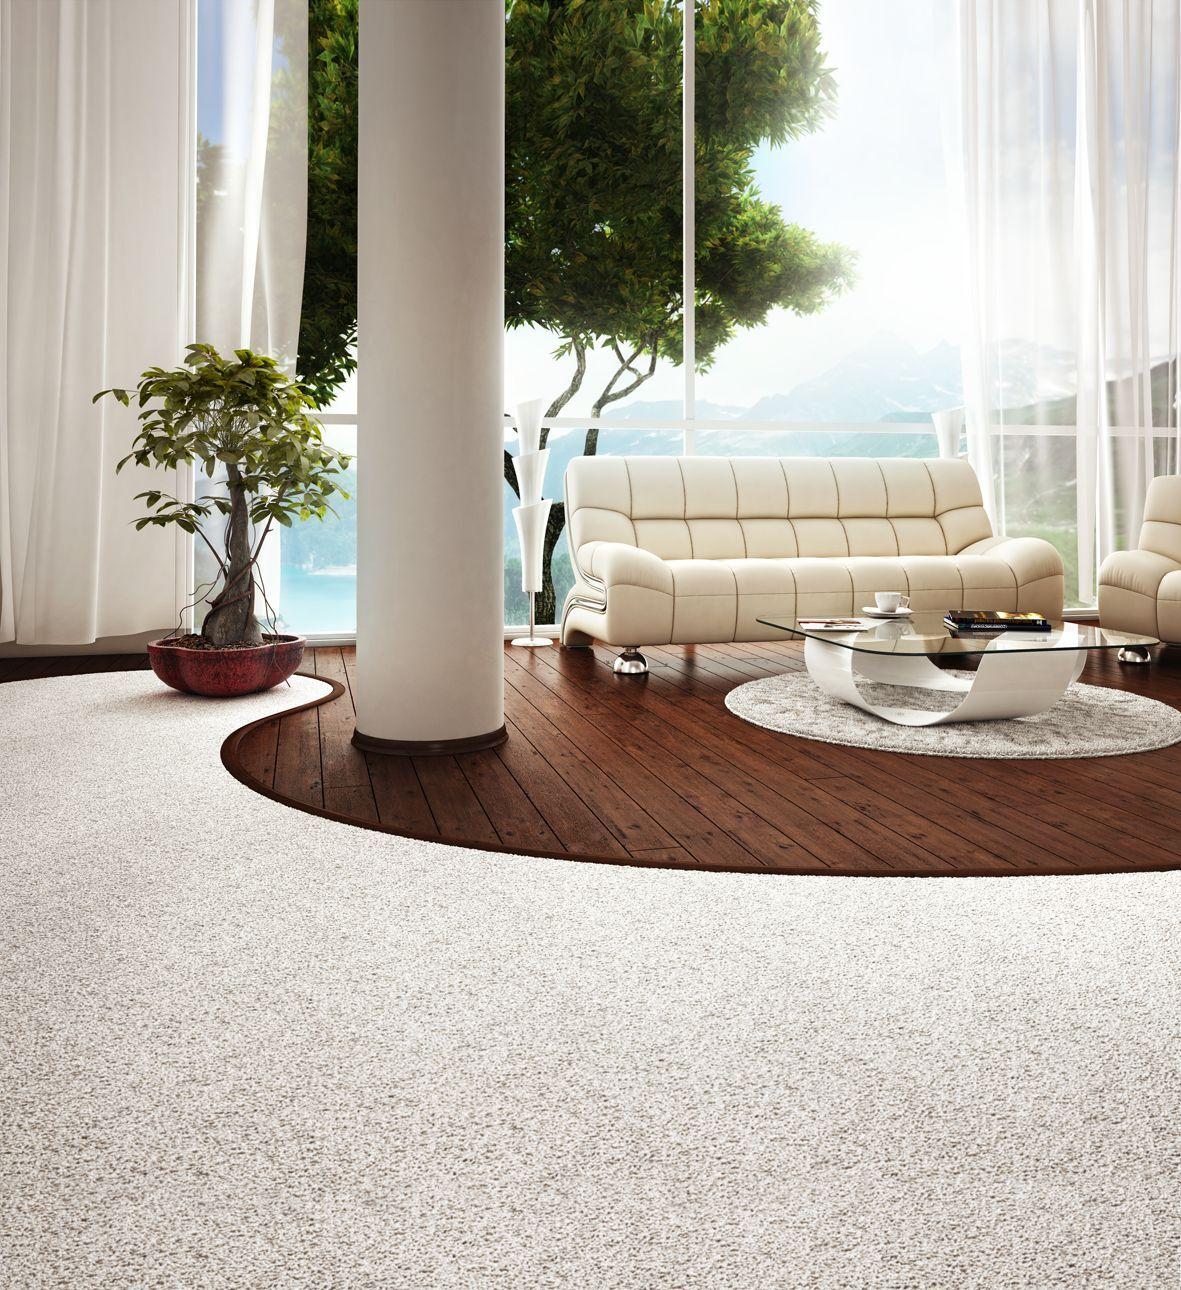 Flexible flooring profile transition profile strip floor for Floor profile